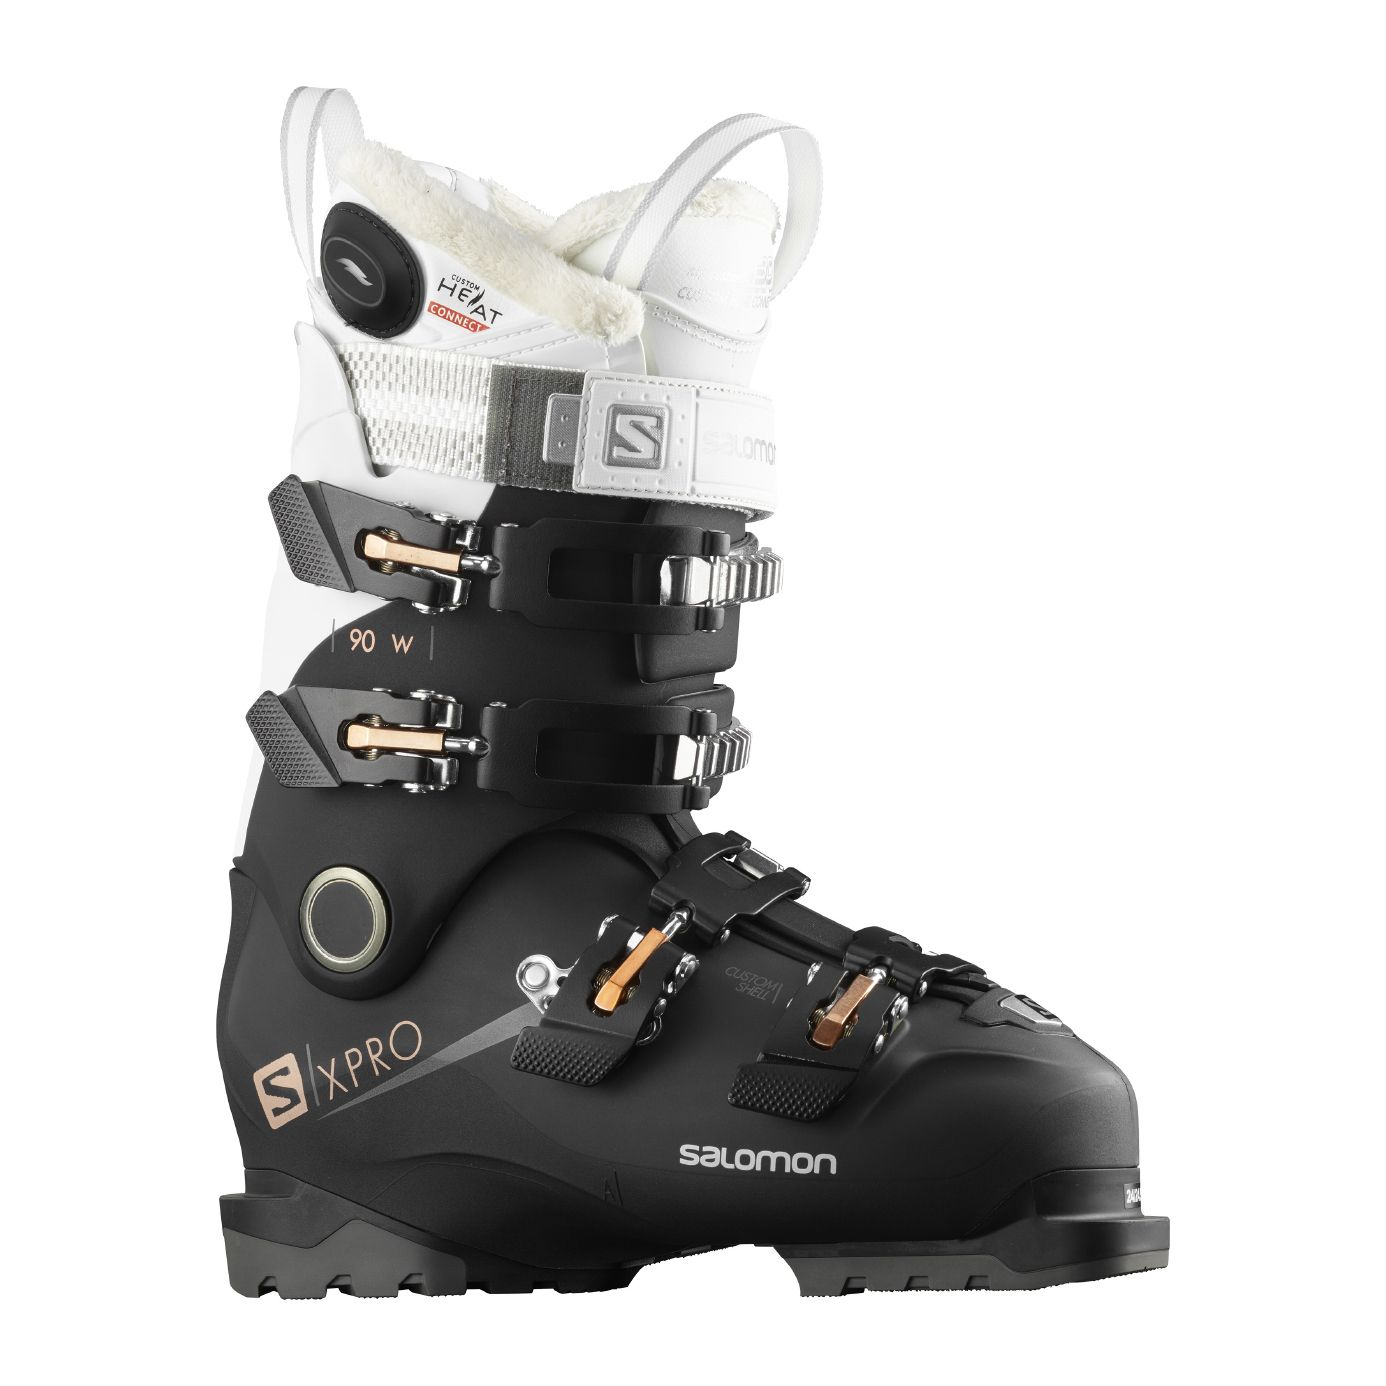 Chaussure de ski Salomon X Pro 100 Custom Heat Connect Black Metallic Black White